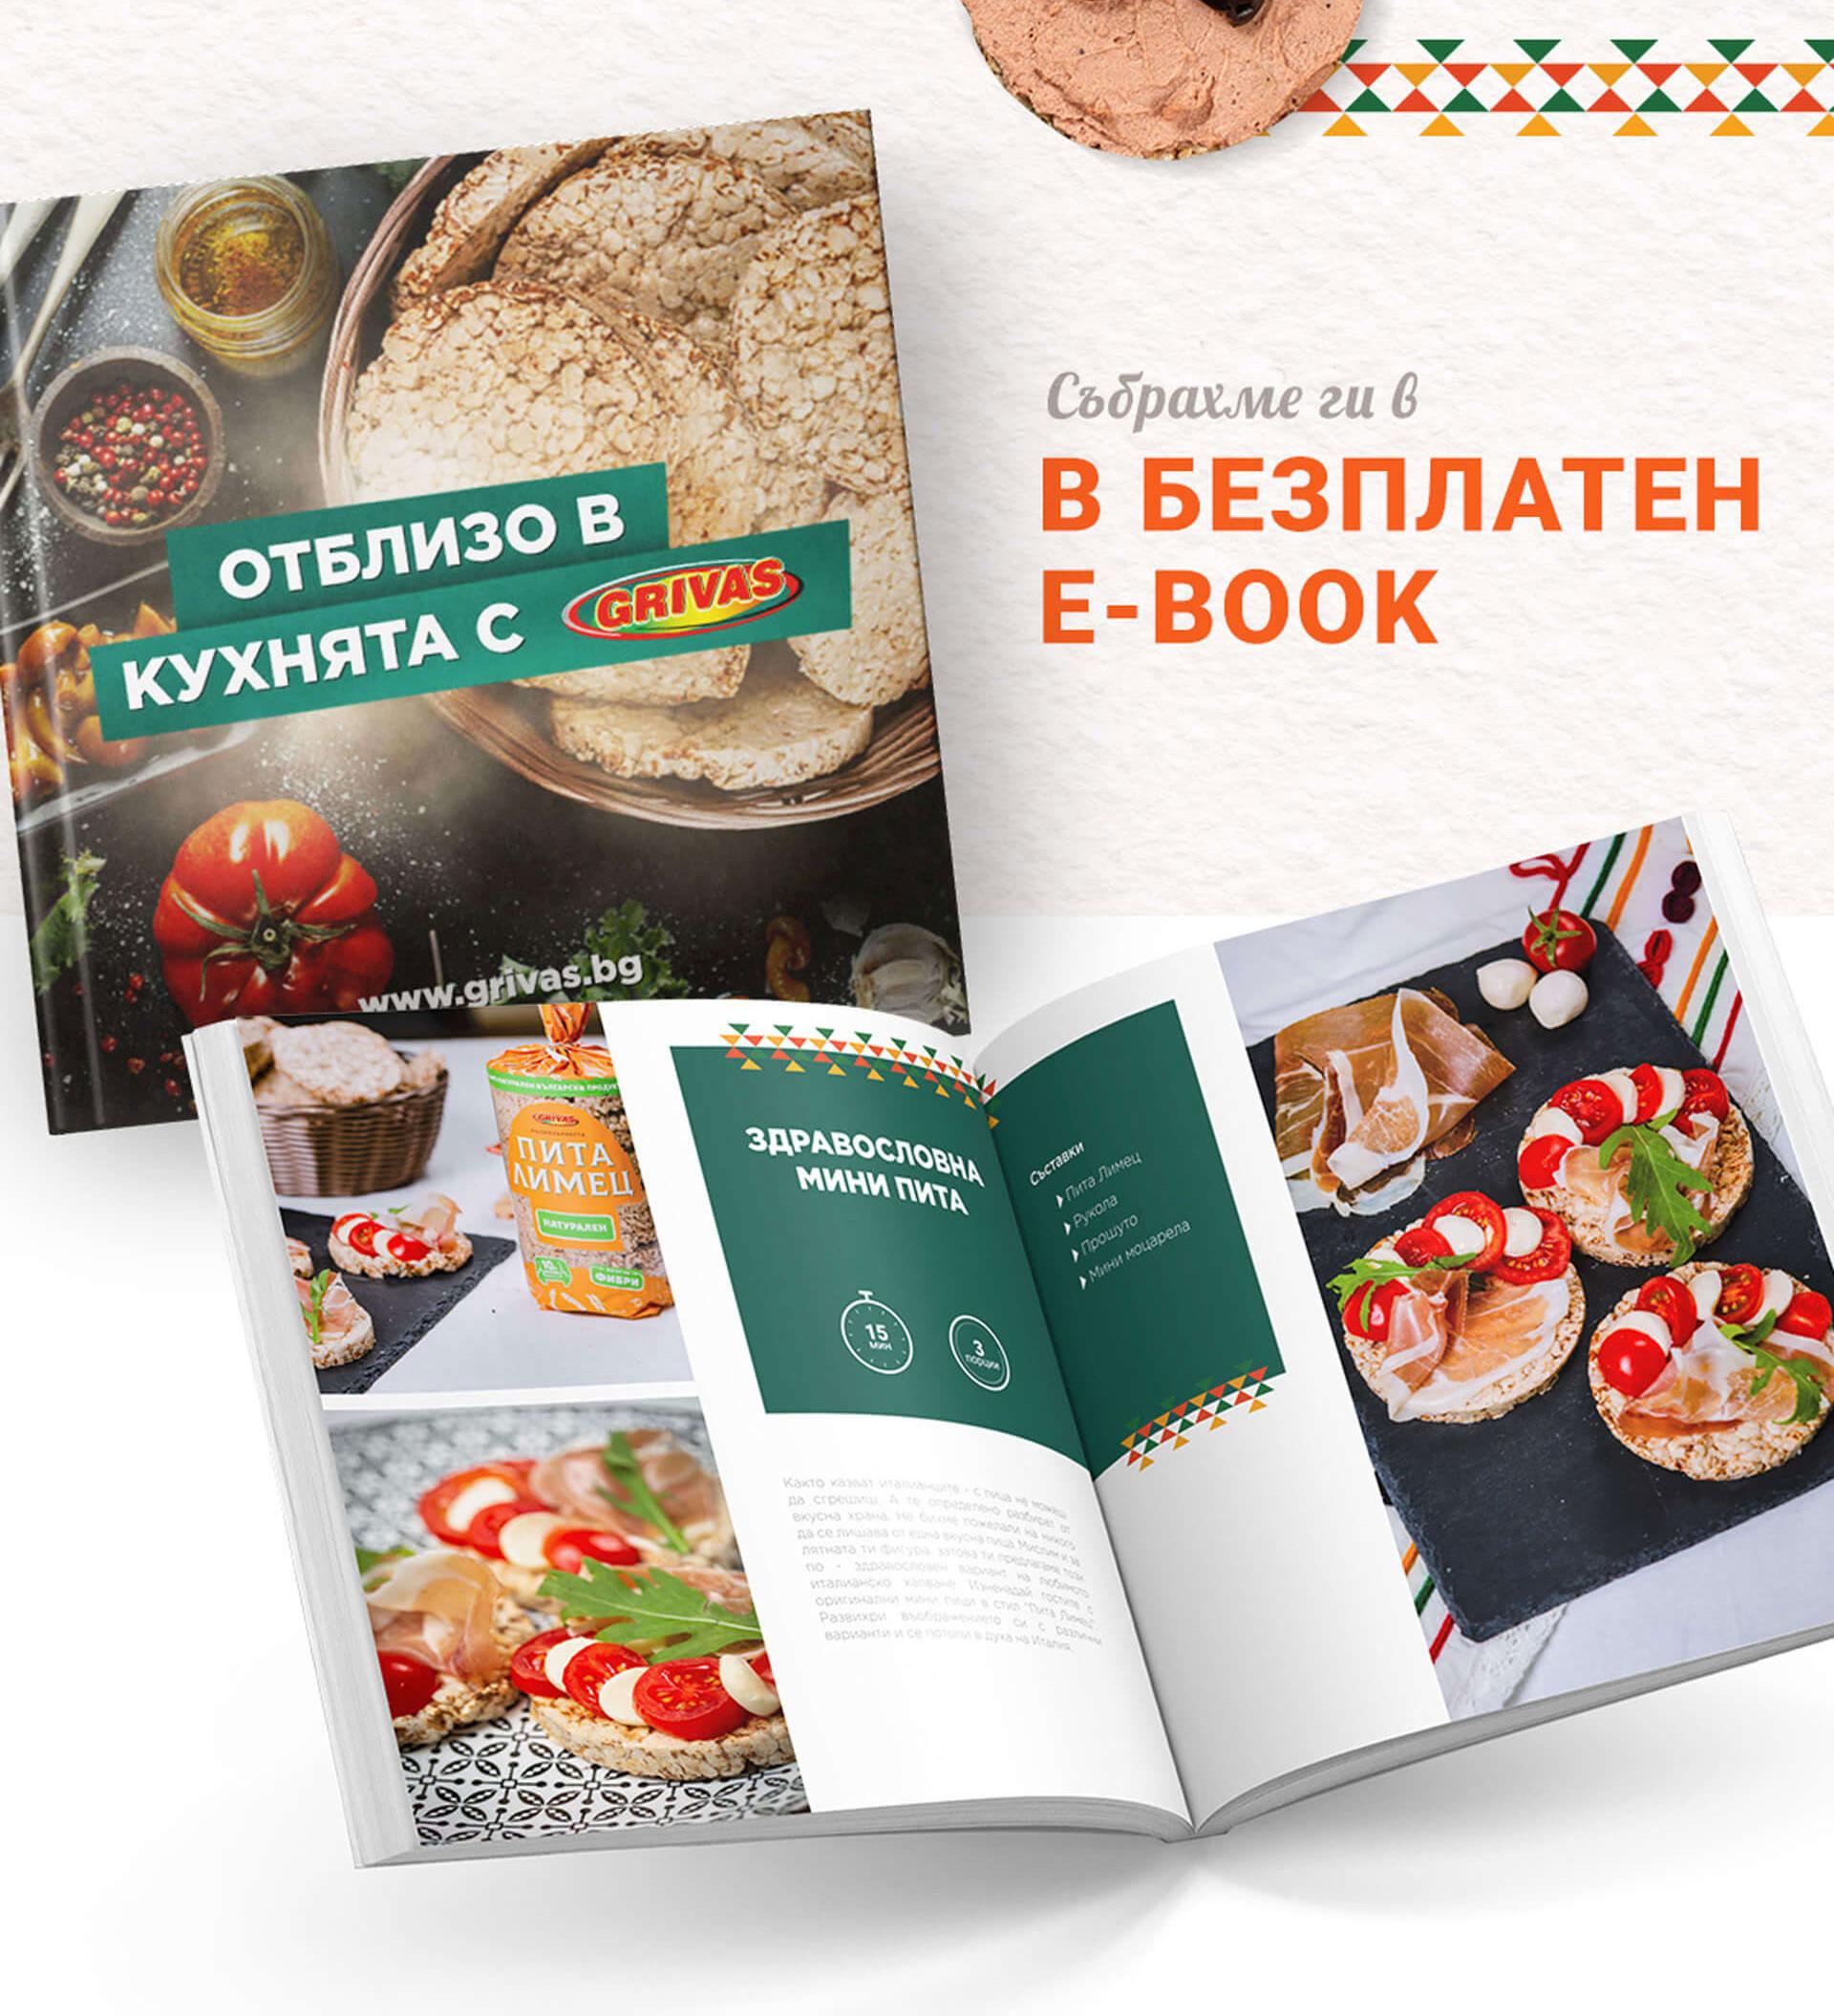 Pita-eyas-part3-comp2